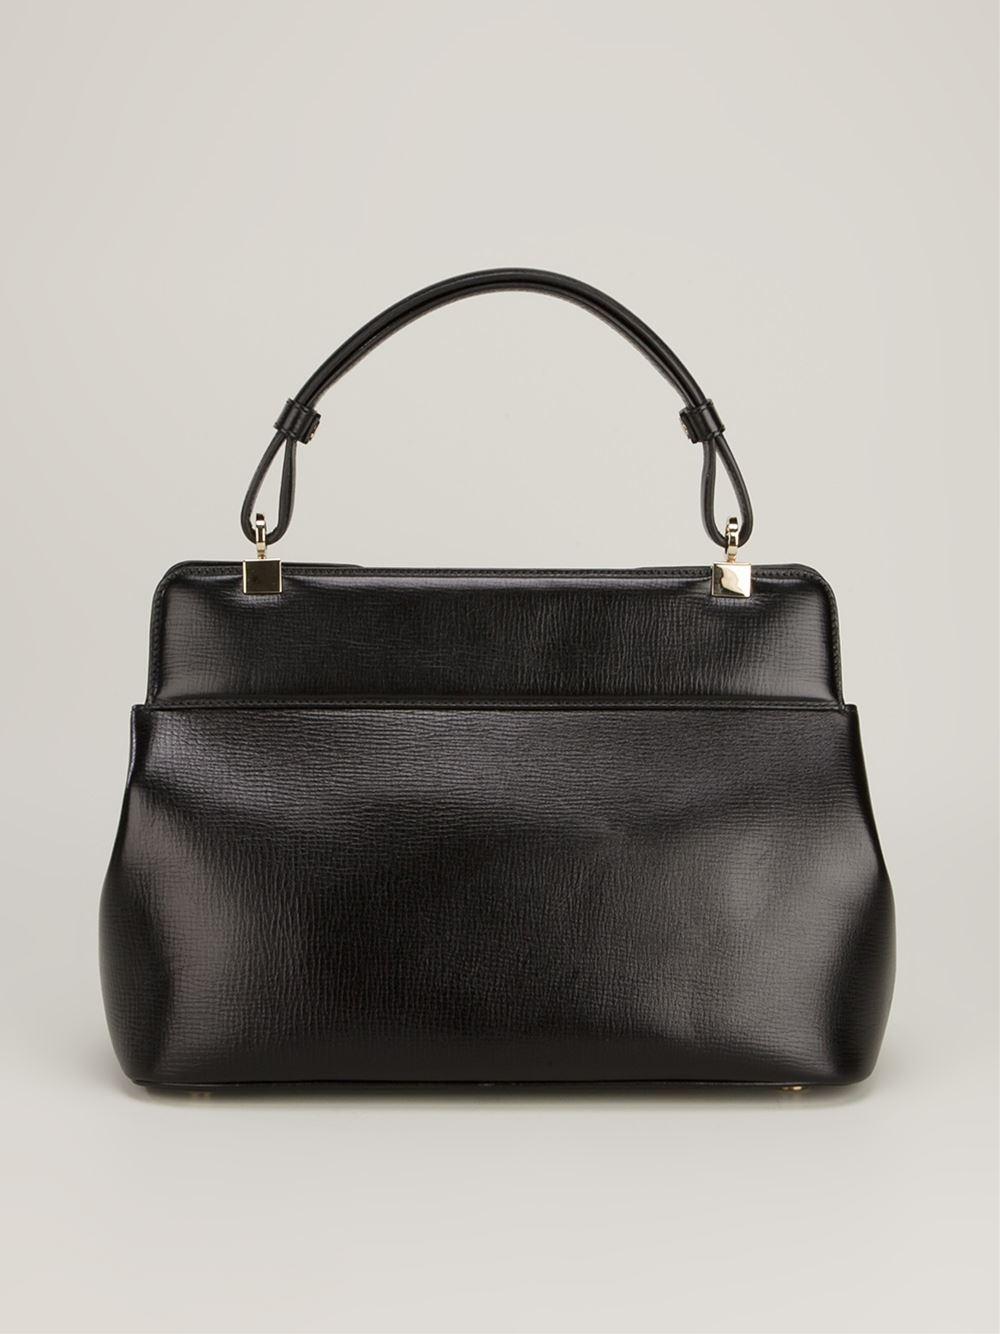 BVLGARI Isabella Rossellini Leather Tote in Black